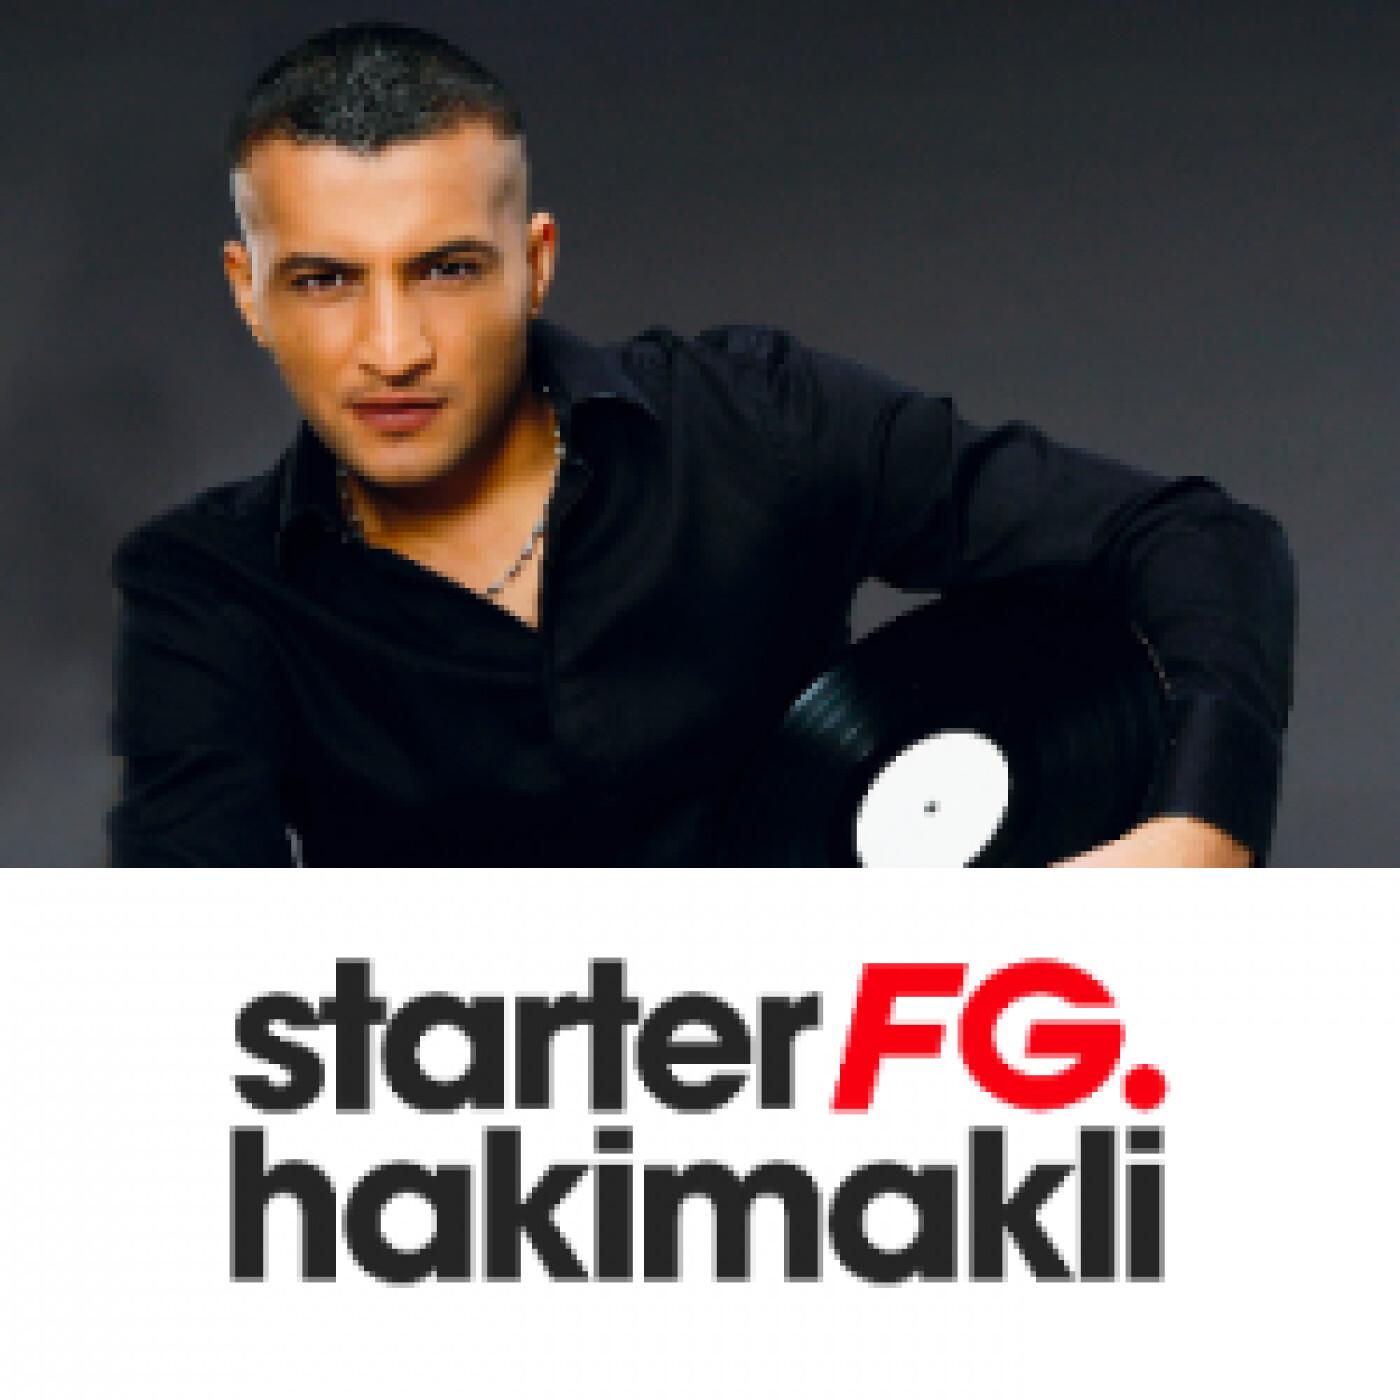 STARTER FG BY HAKIMAKLI MARDI 6 AVRIL 2021